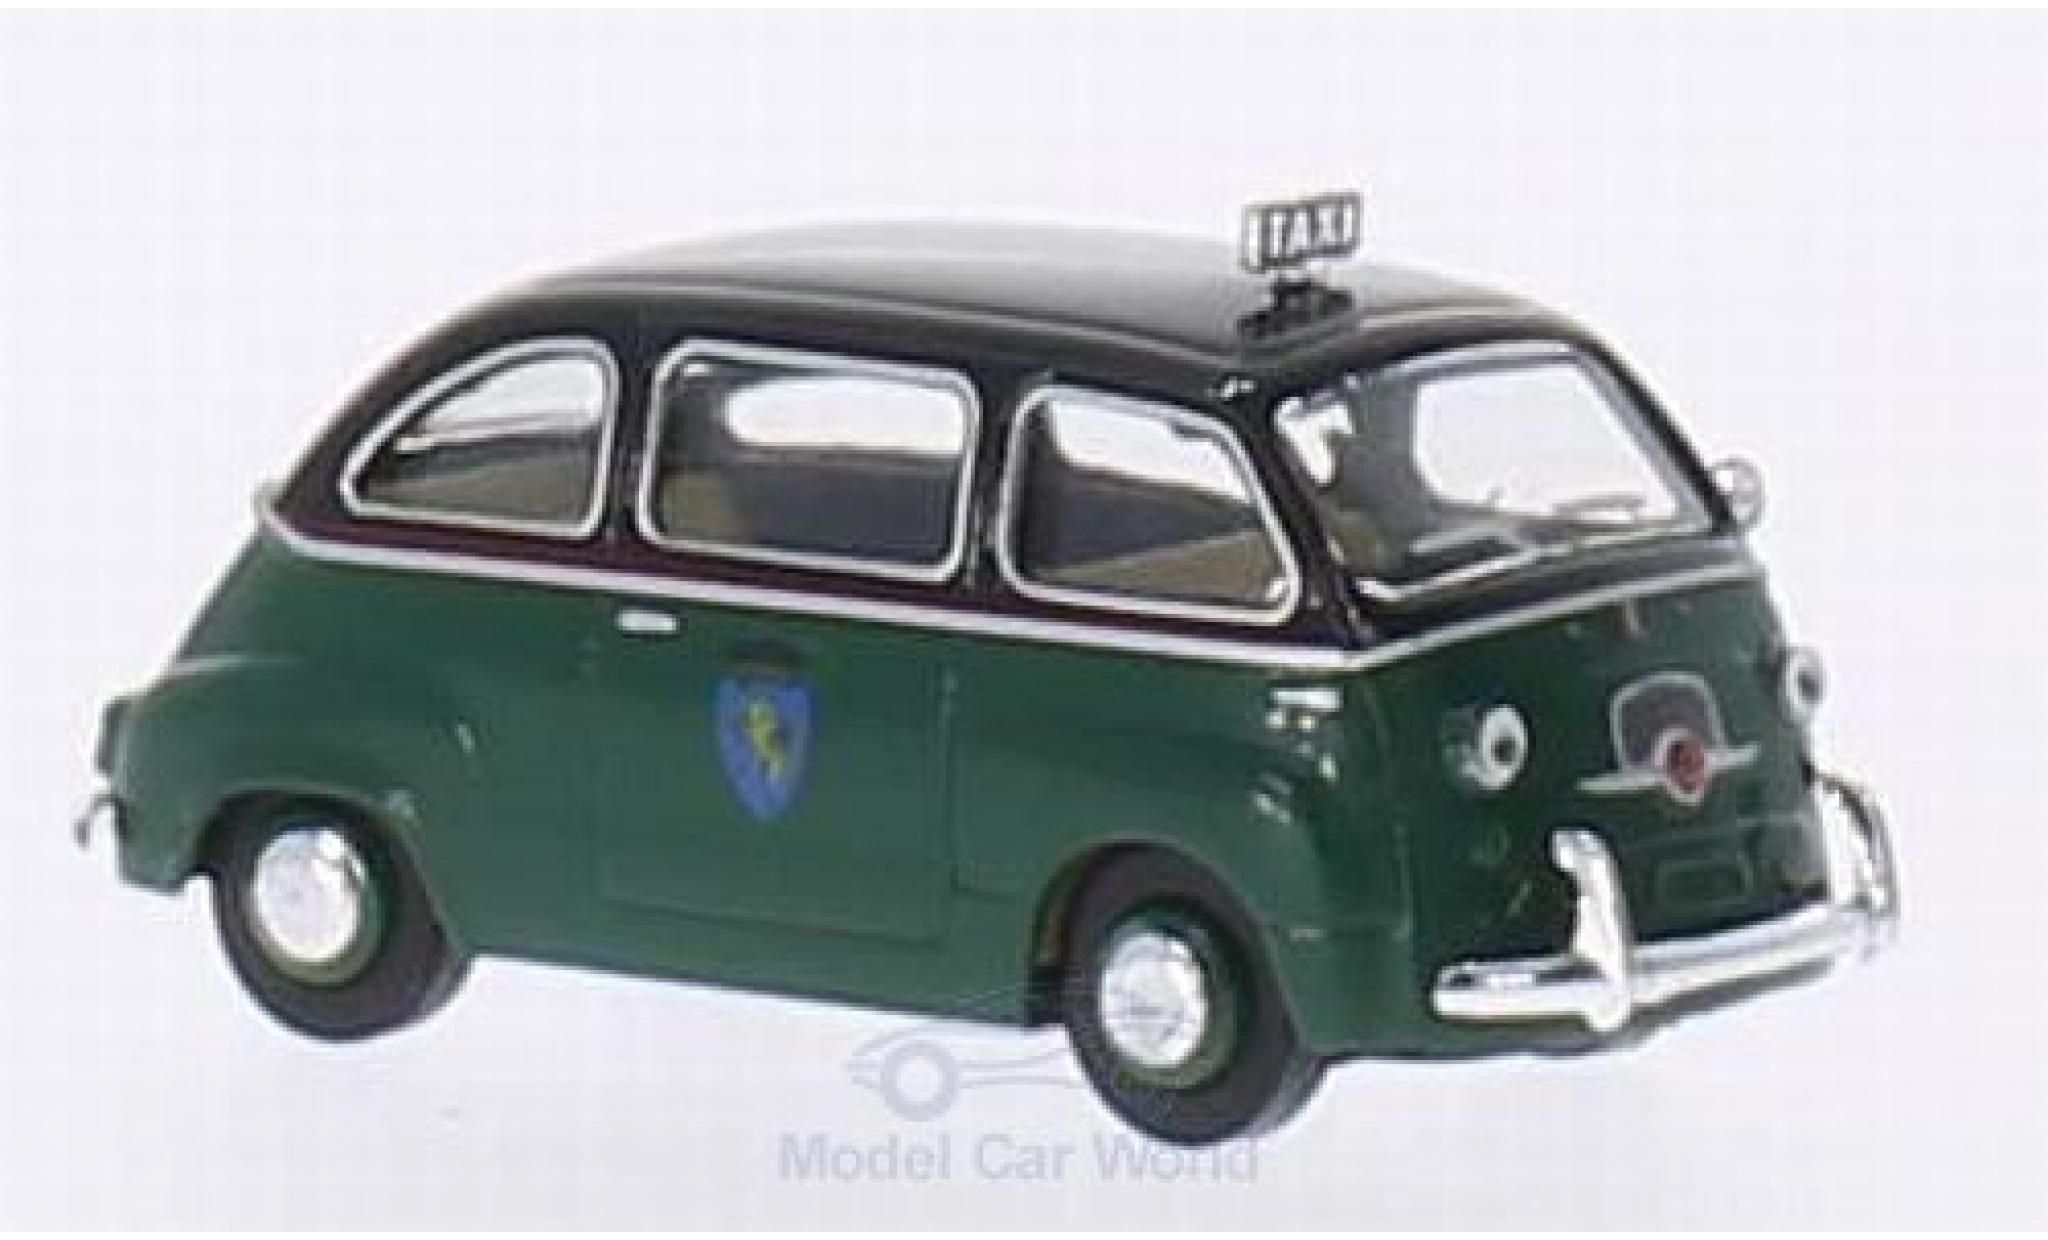 Fiat Multipla 1/87 Brekina Taxi Turin / Torino (I)